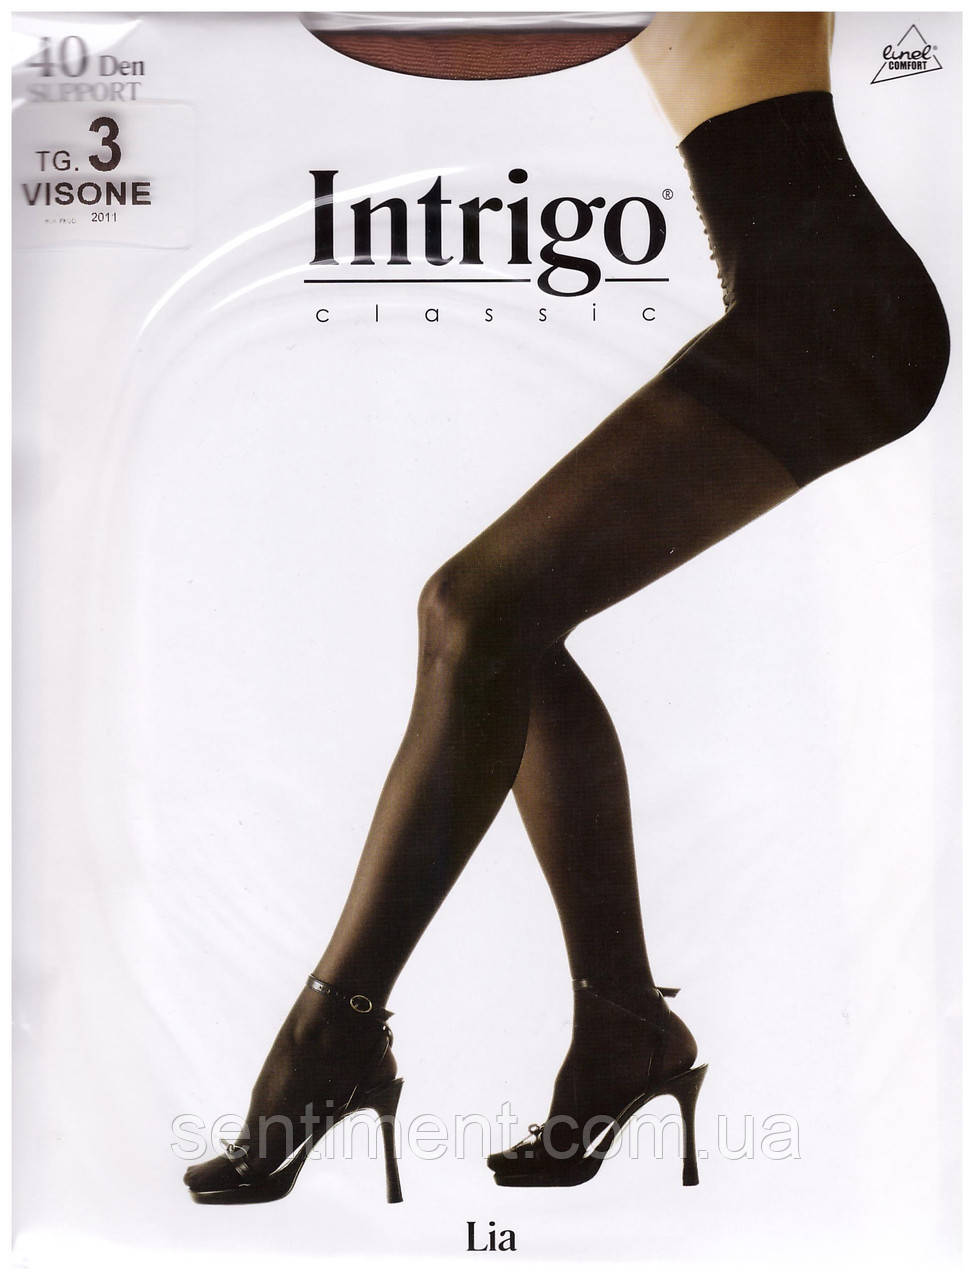 Колготы Intrigo classic Lia (support) 40 den. Опт и розница.